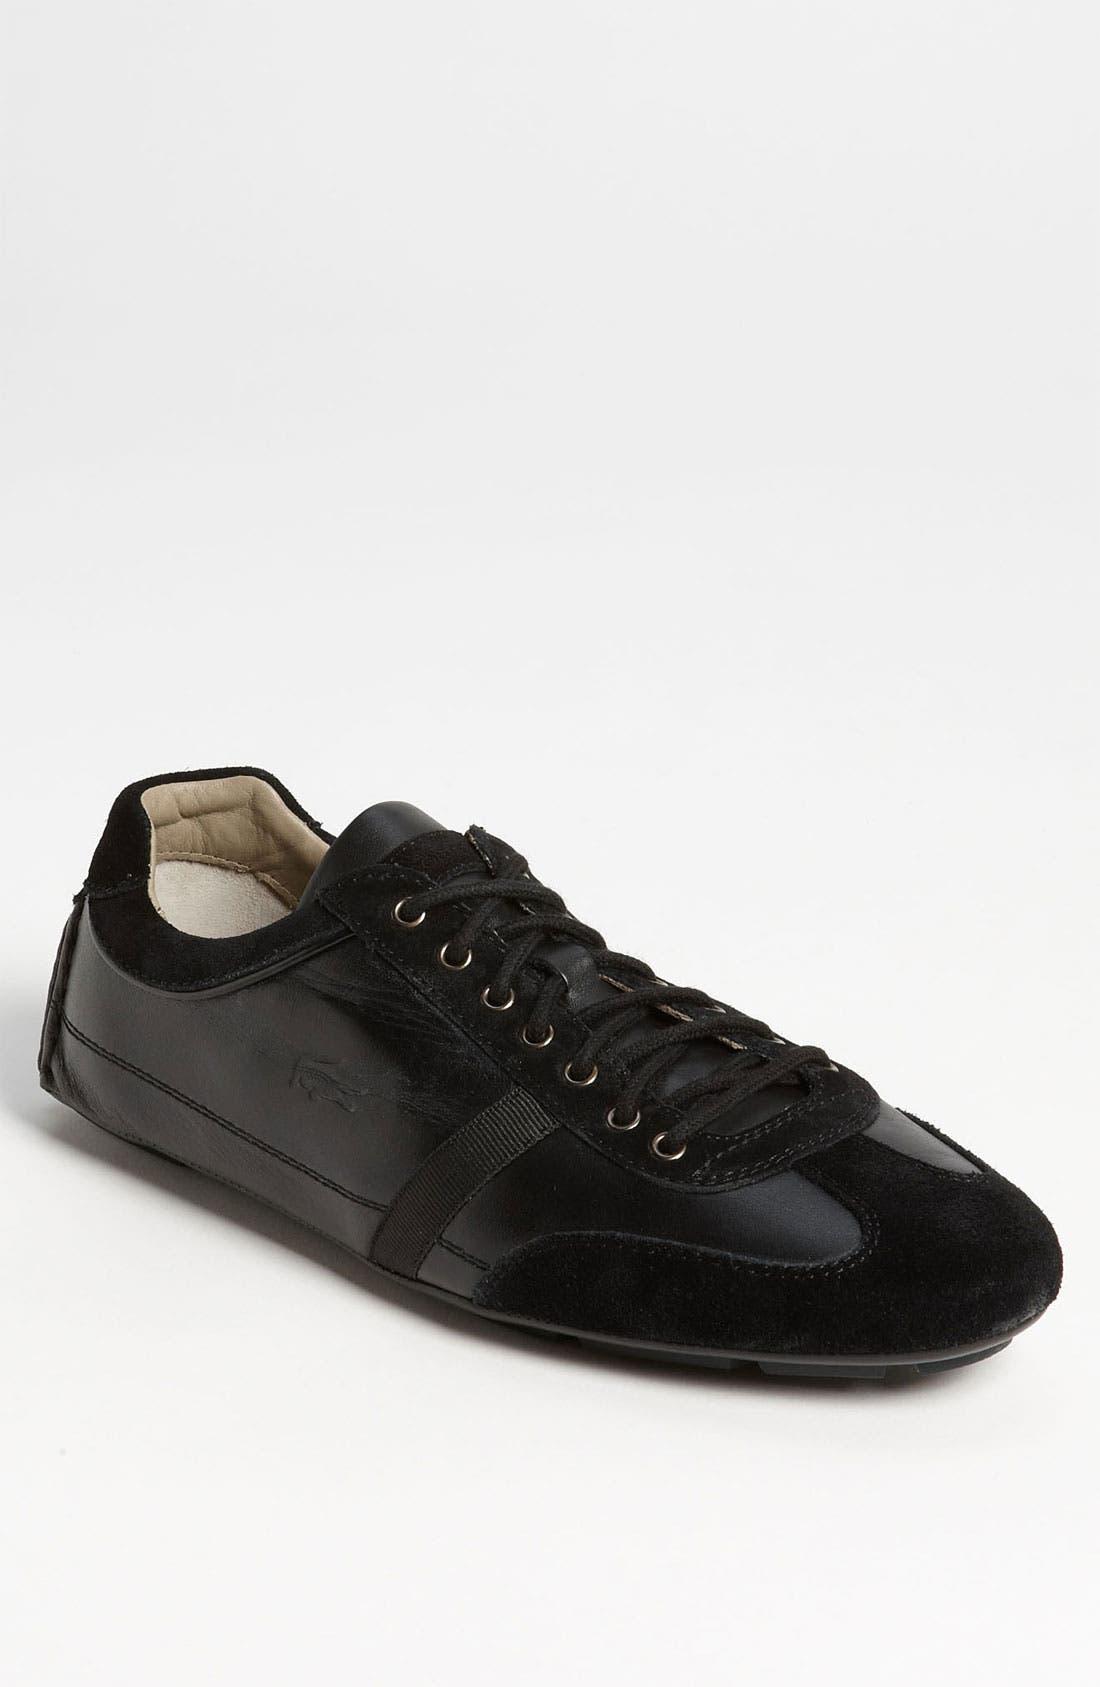 Alternate Image 1 Selected - Lacoste 'Berryman' Sneaker